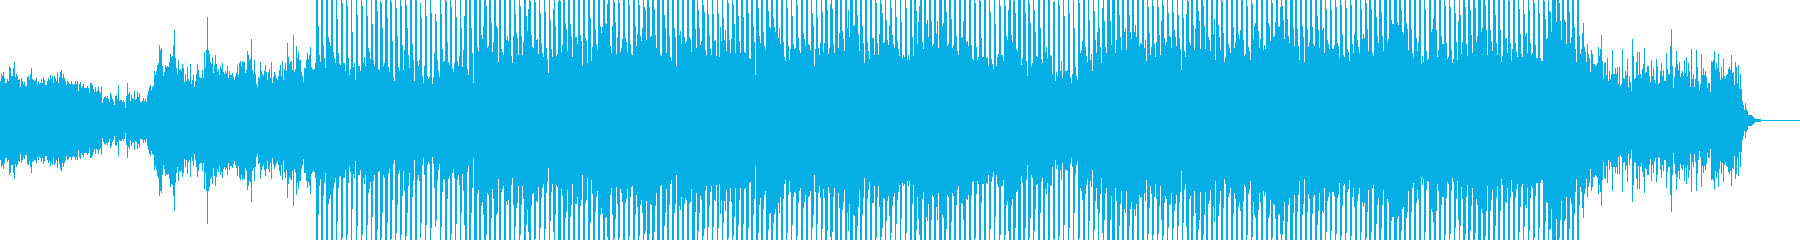 EDMクラブ系ダンスミュージック-38の再生済みの波形